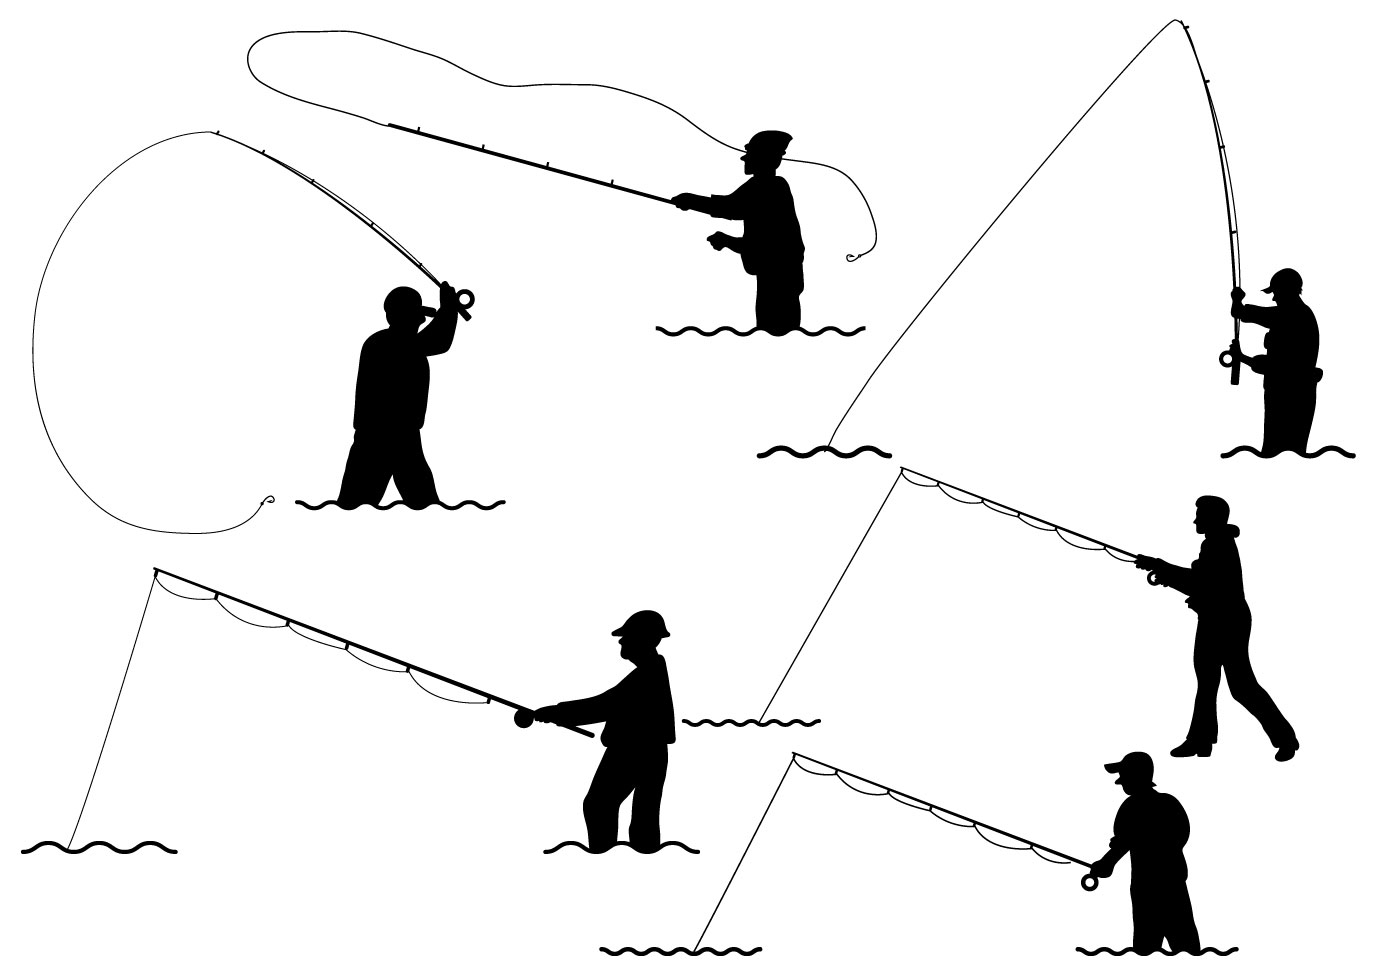 Fly Fishing Vector - Download Free Vector Art, Stock ...